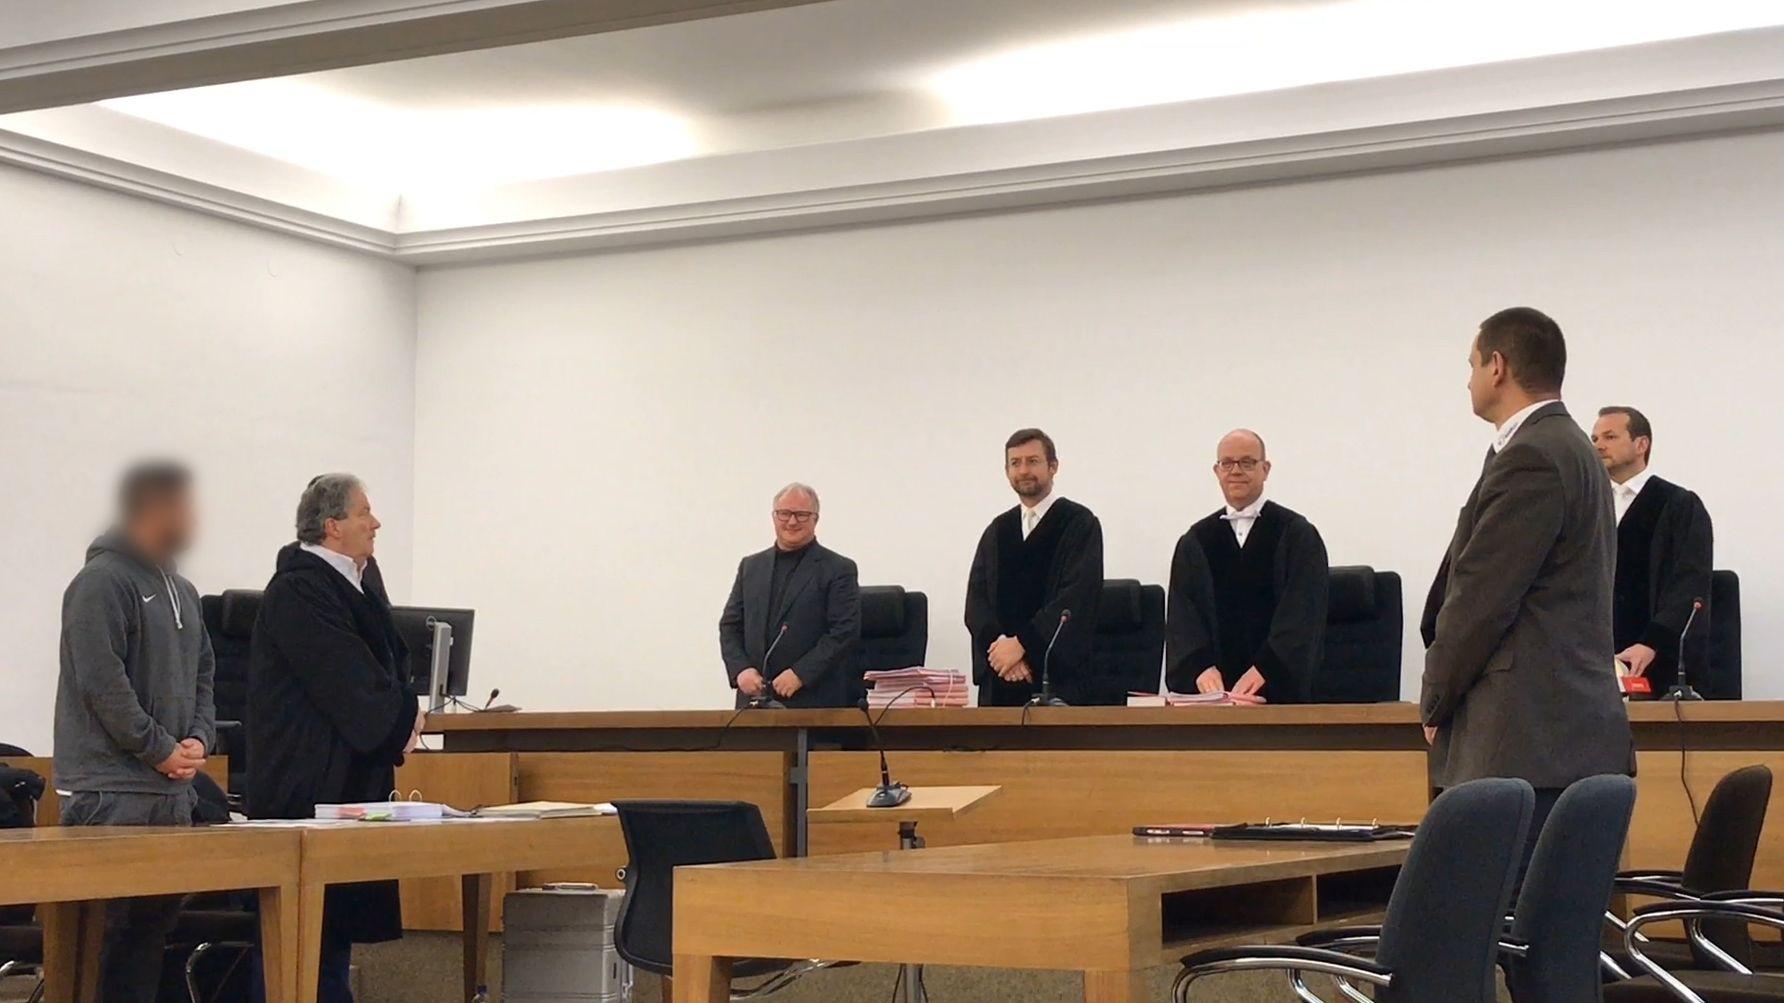 Gerichtssaal im Landgericht Kempten